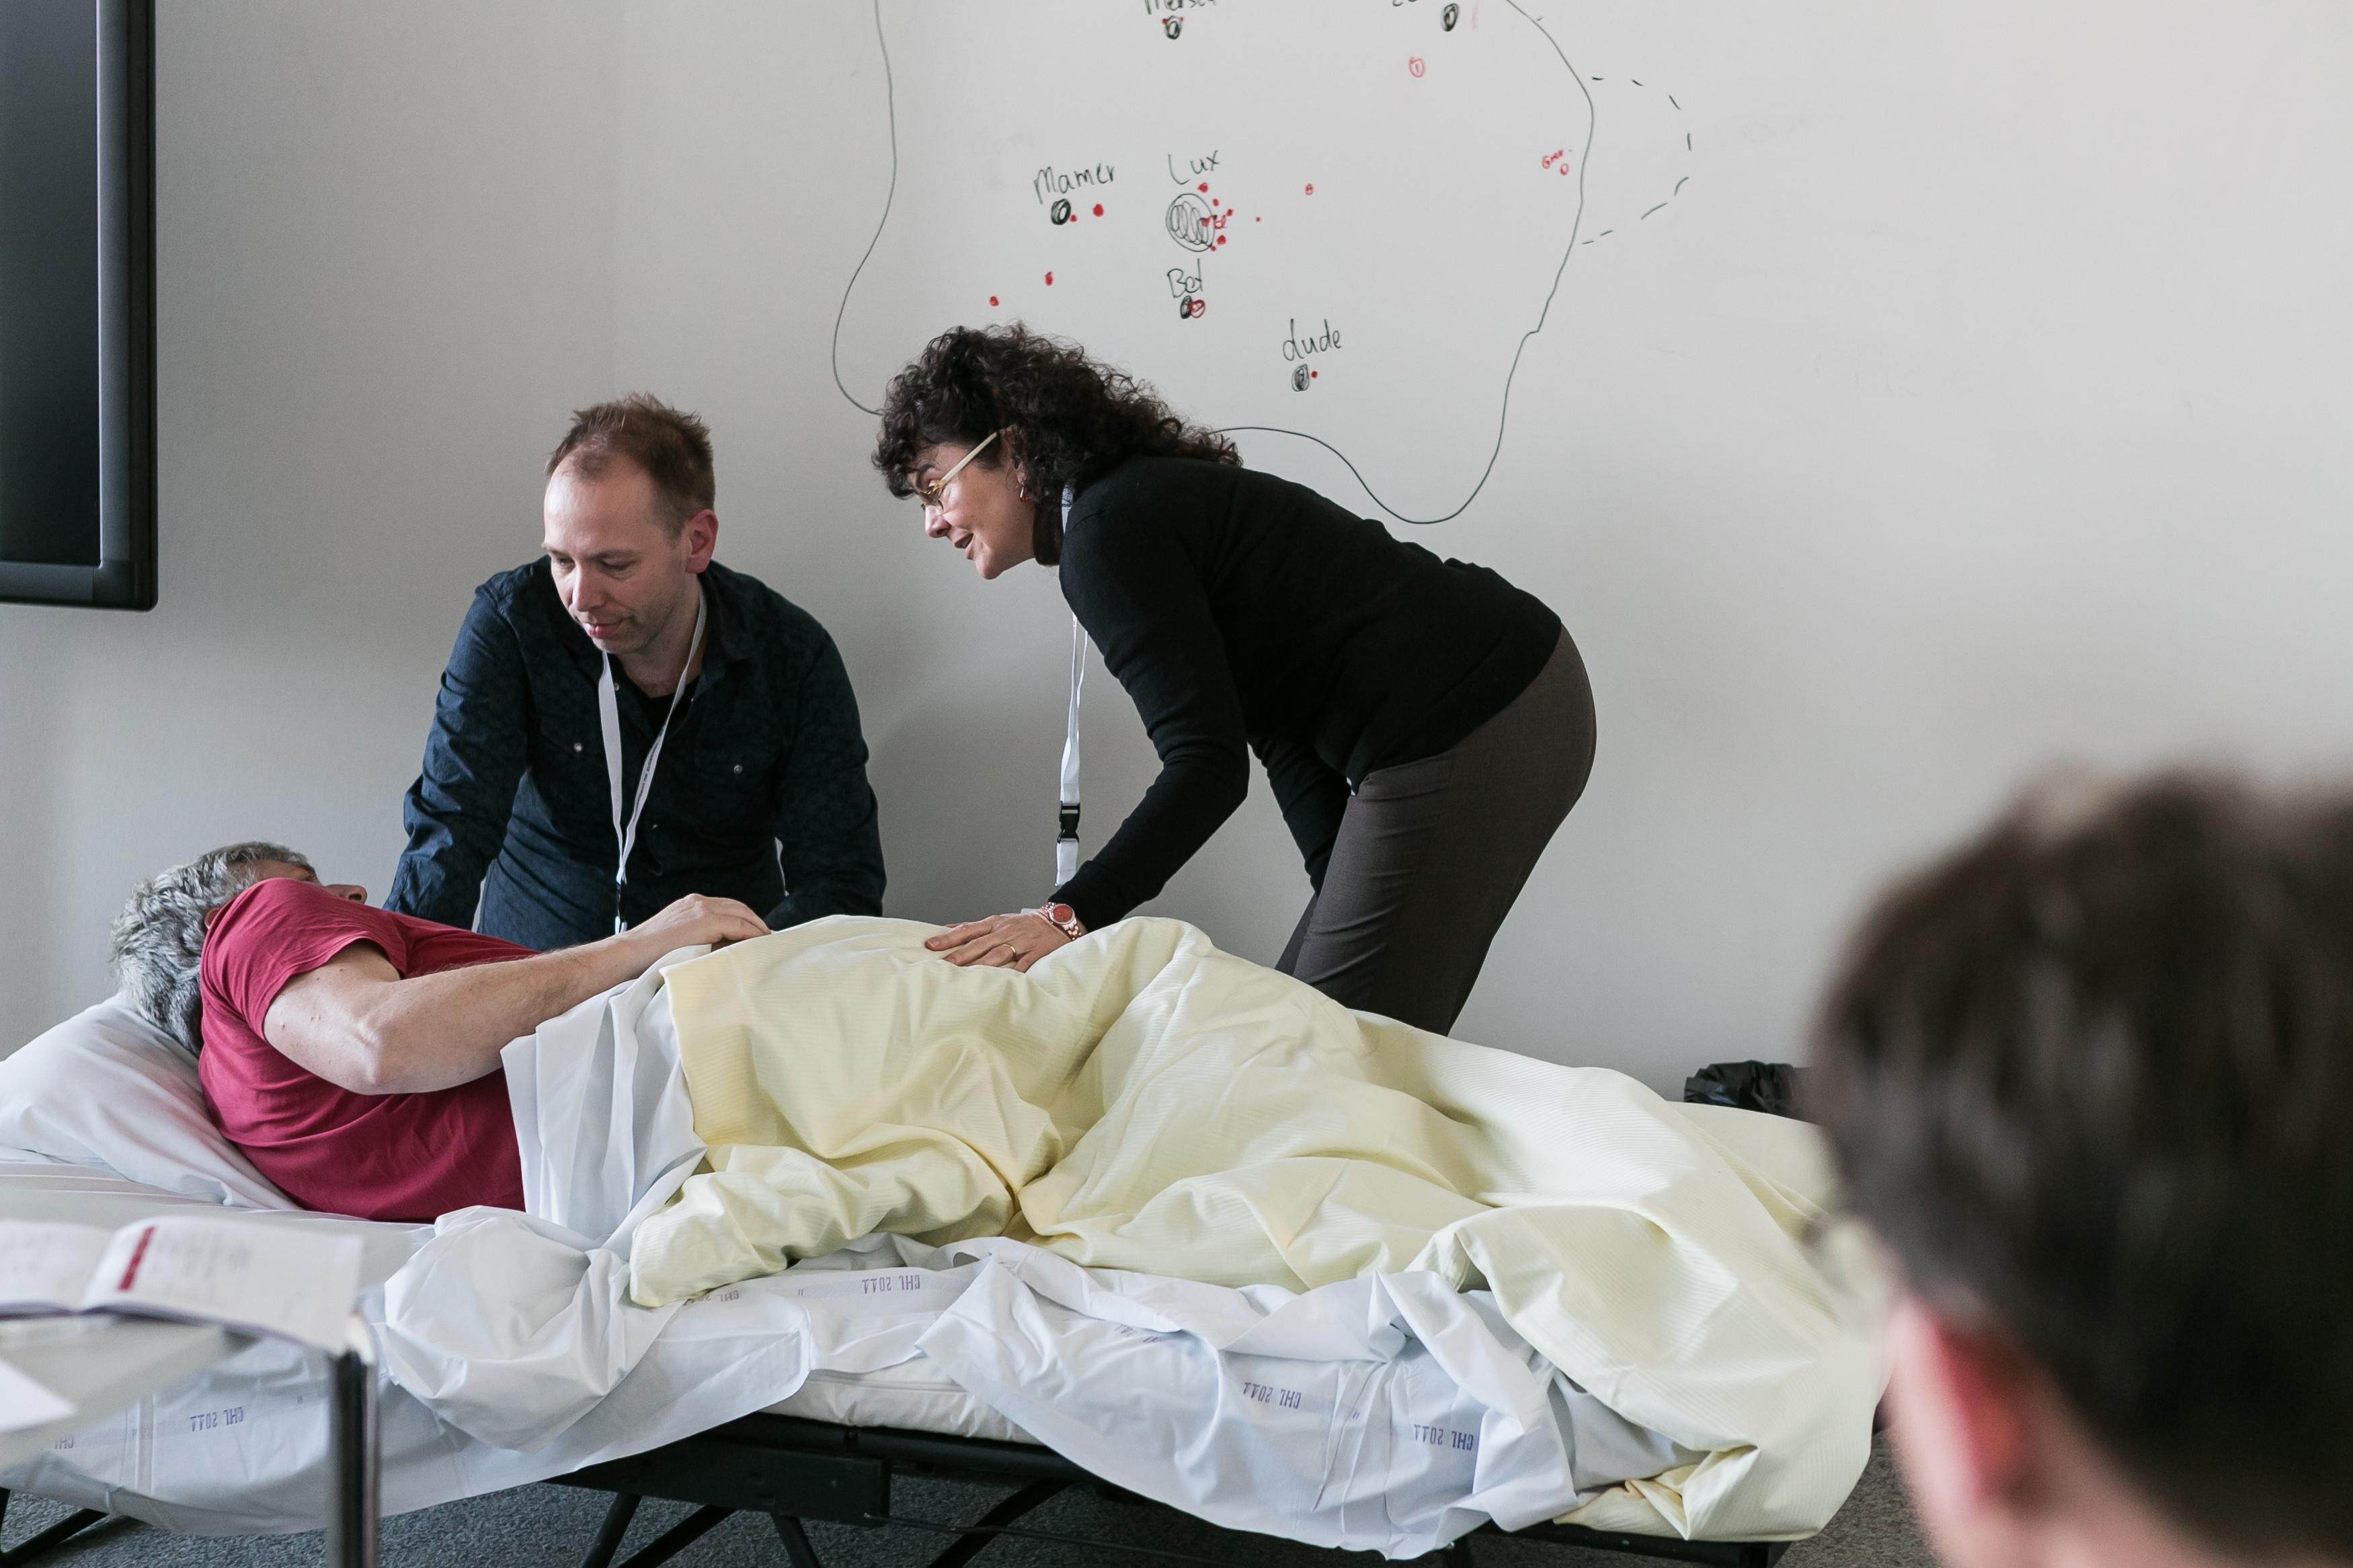 Benefits ParkinsonNet Luxemburg network